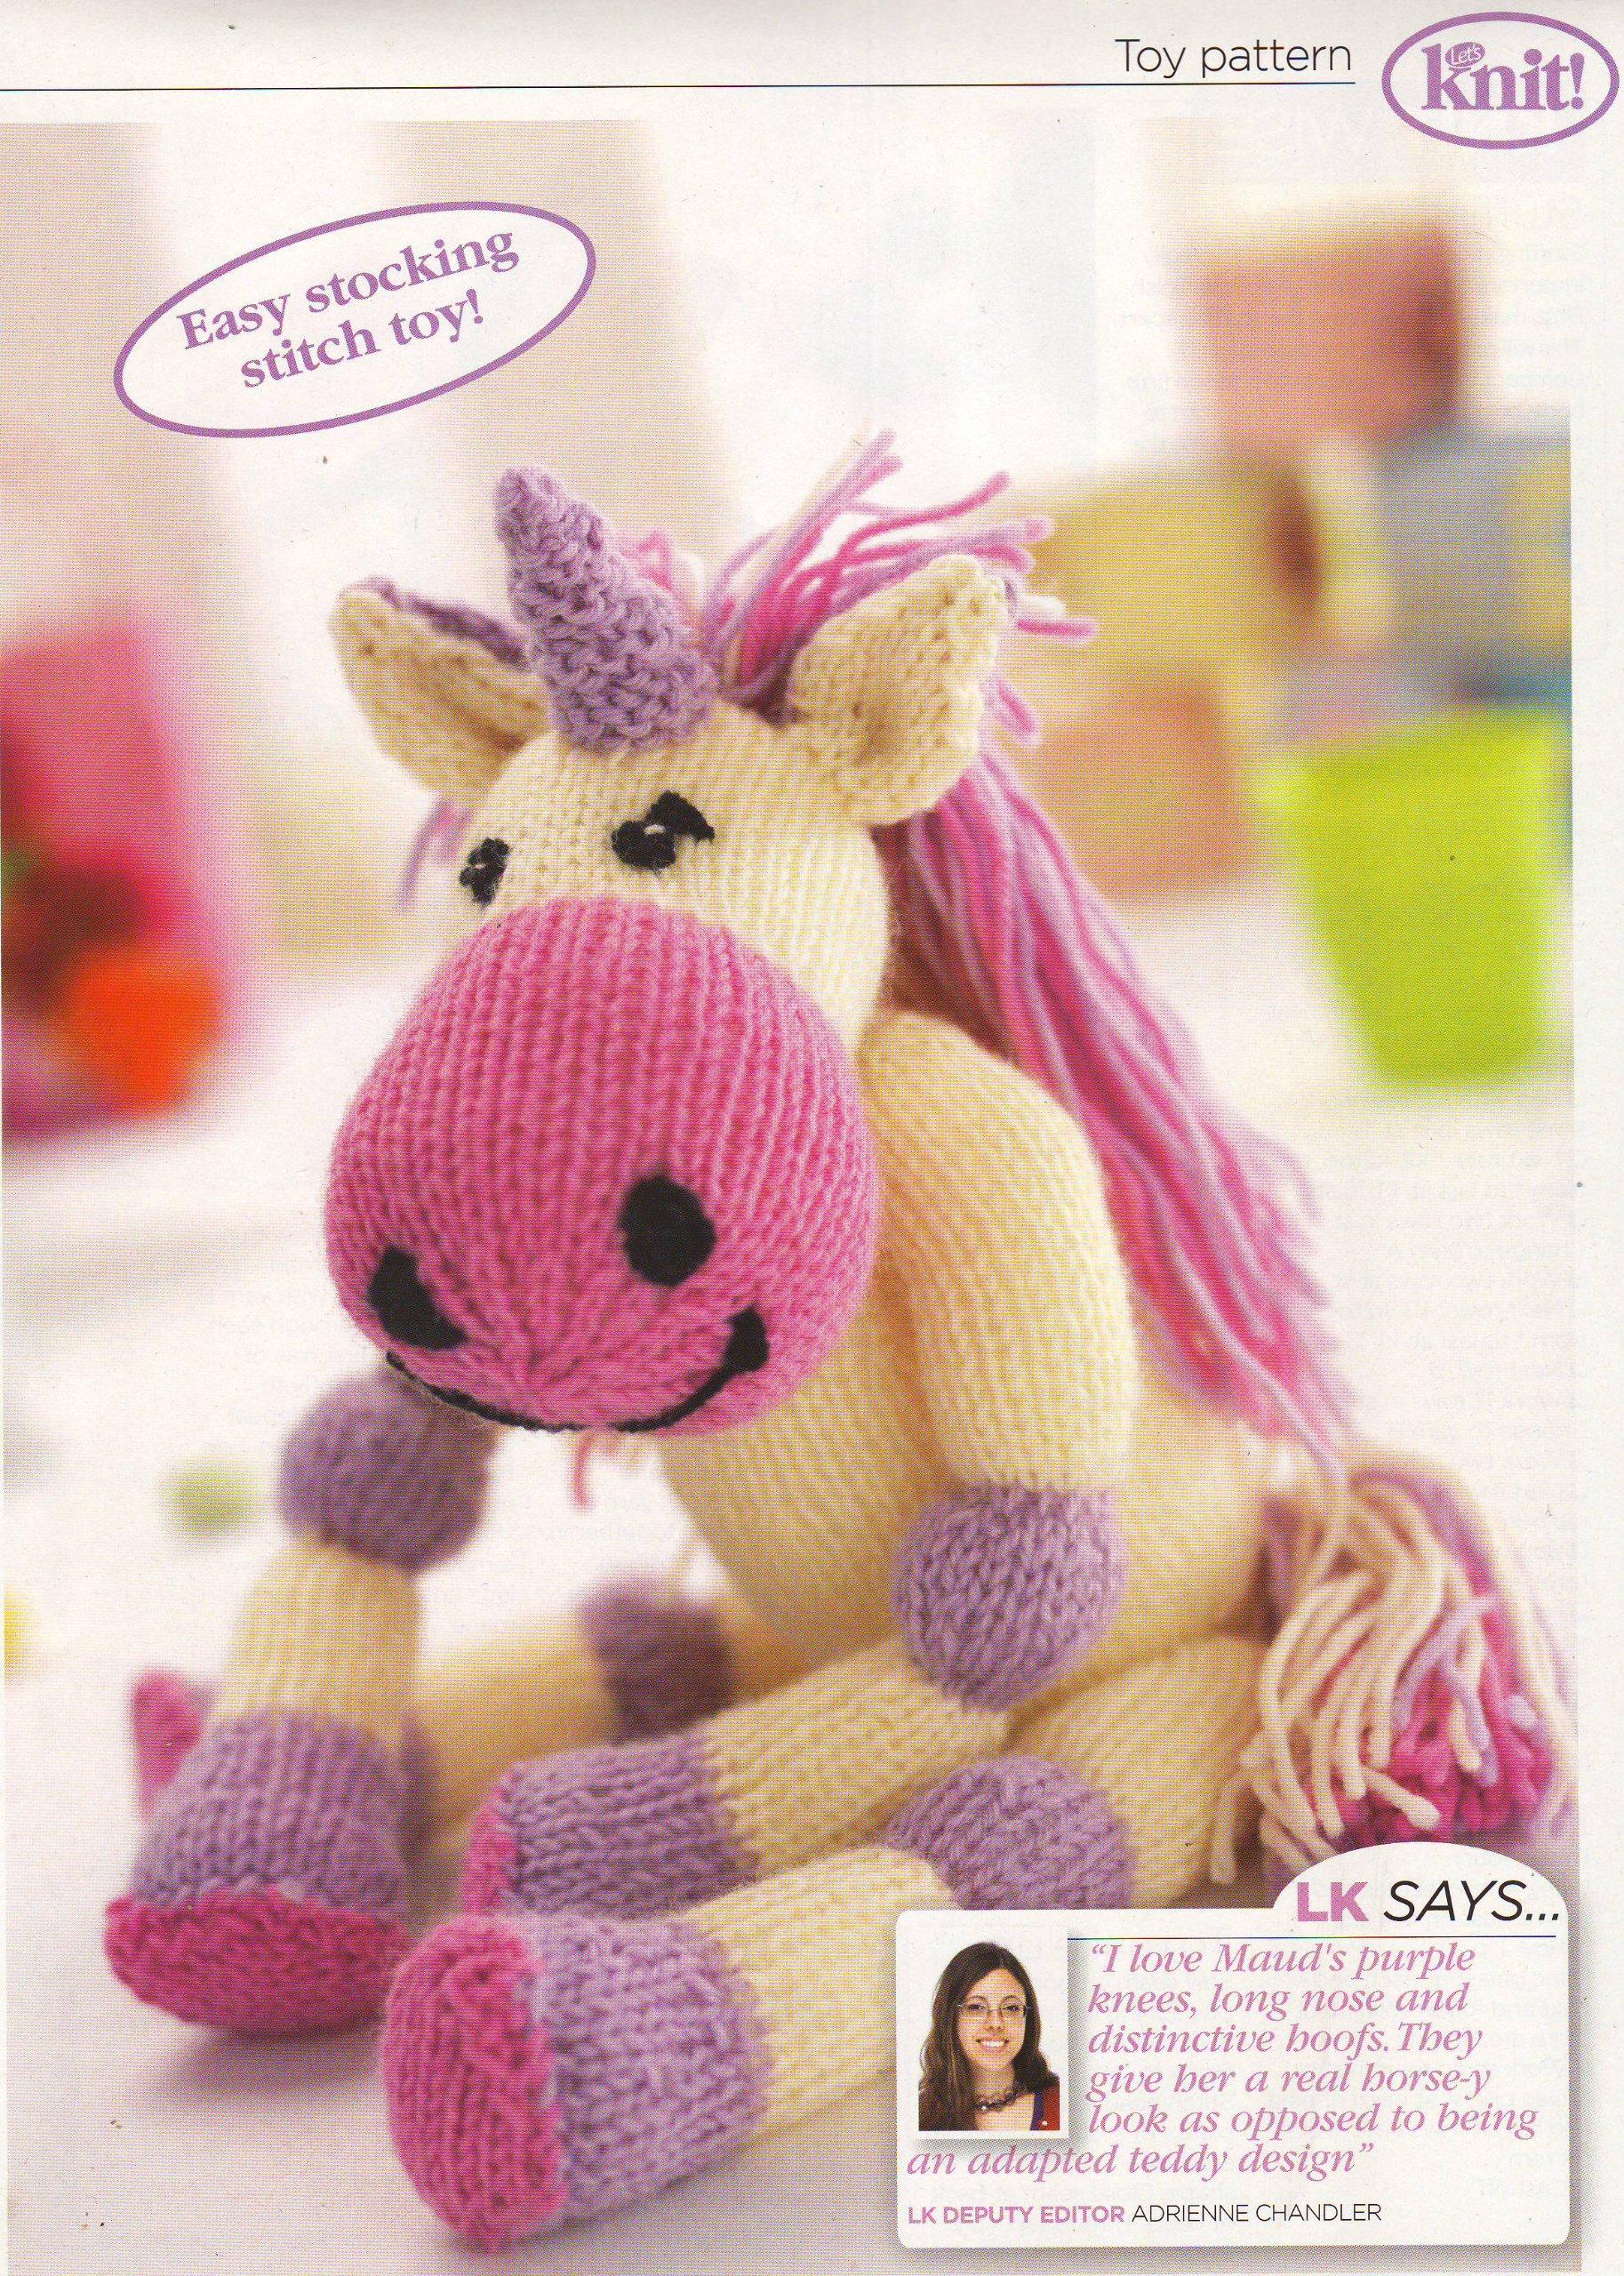 Toy Unicorn Knitting Pattern: Materials Cygnet Superwash DK